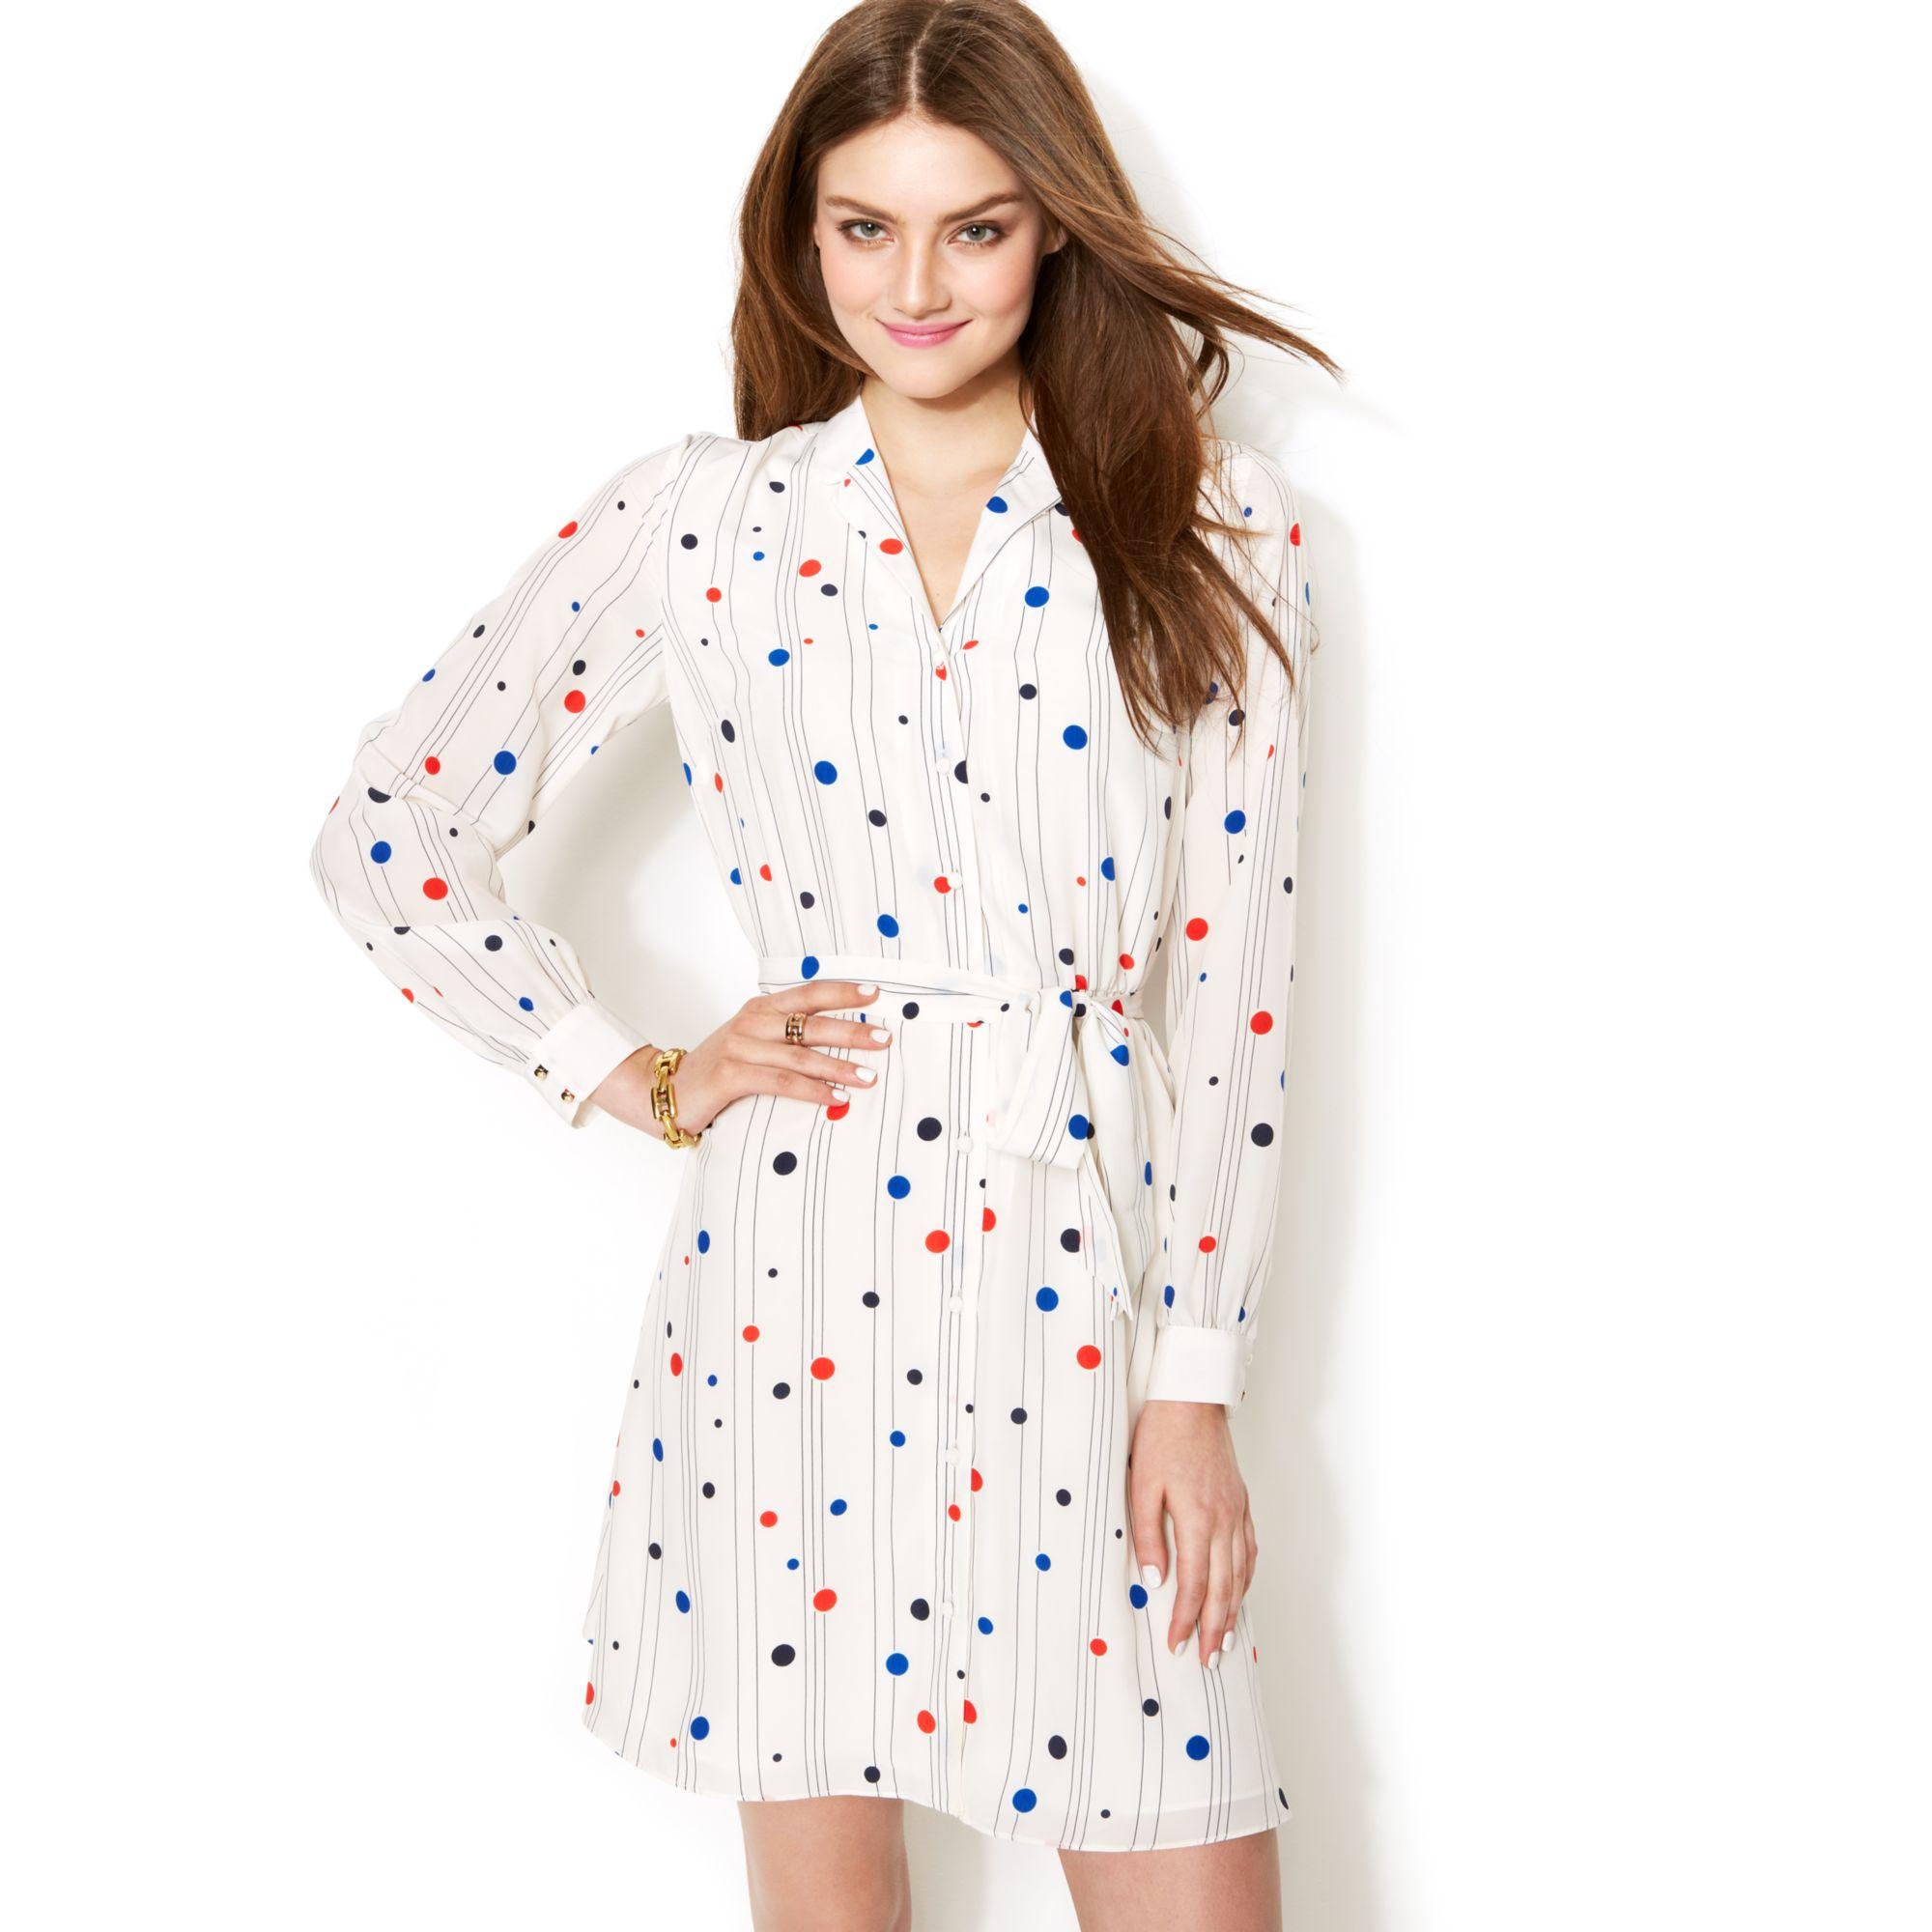 e3e6f96e97c Tommy Hilfiger Zooey Deschanel For Polkadot Printed Shirtdress - Lyst